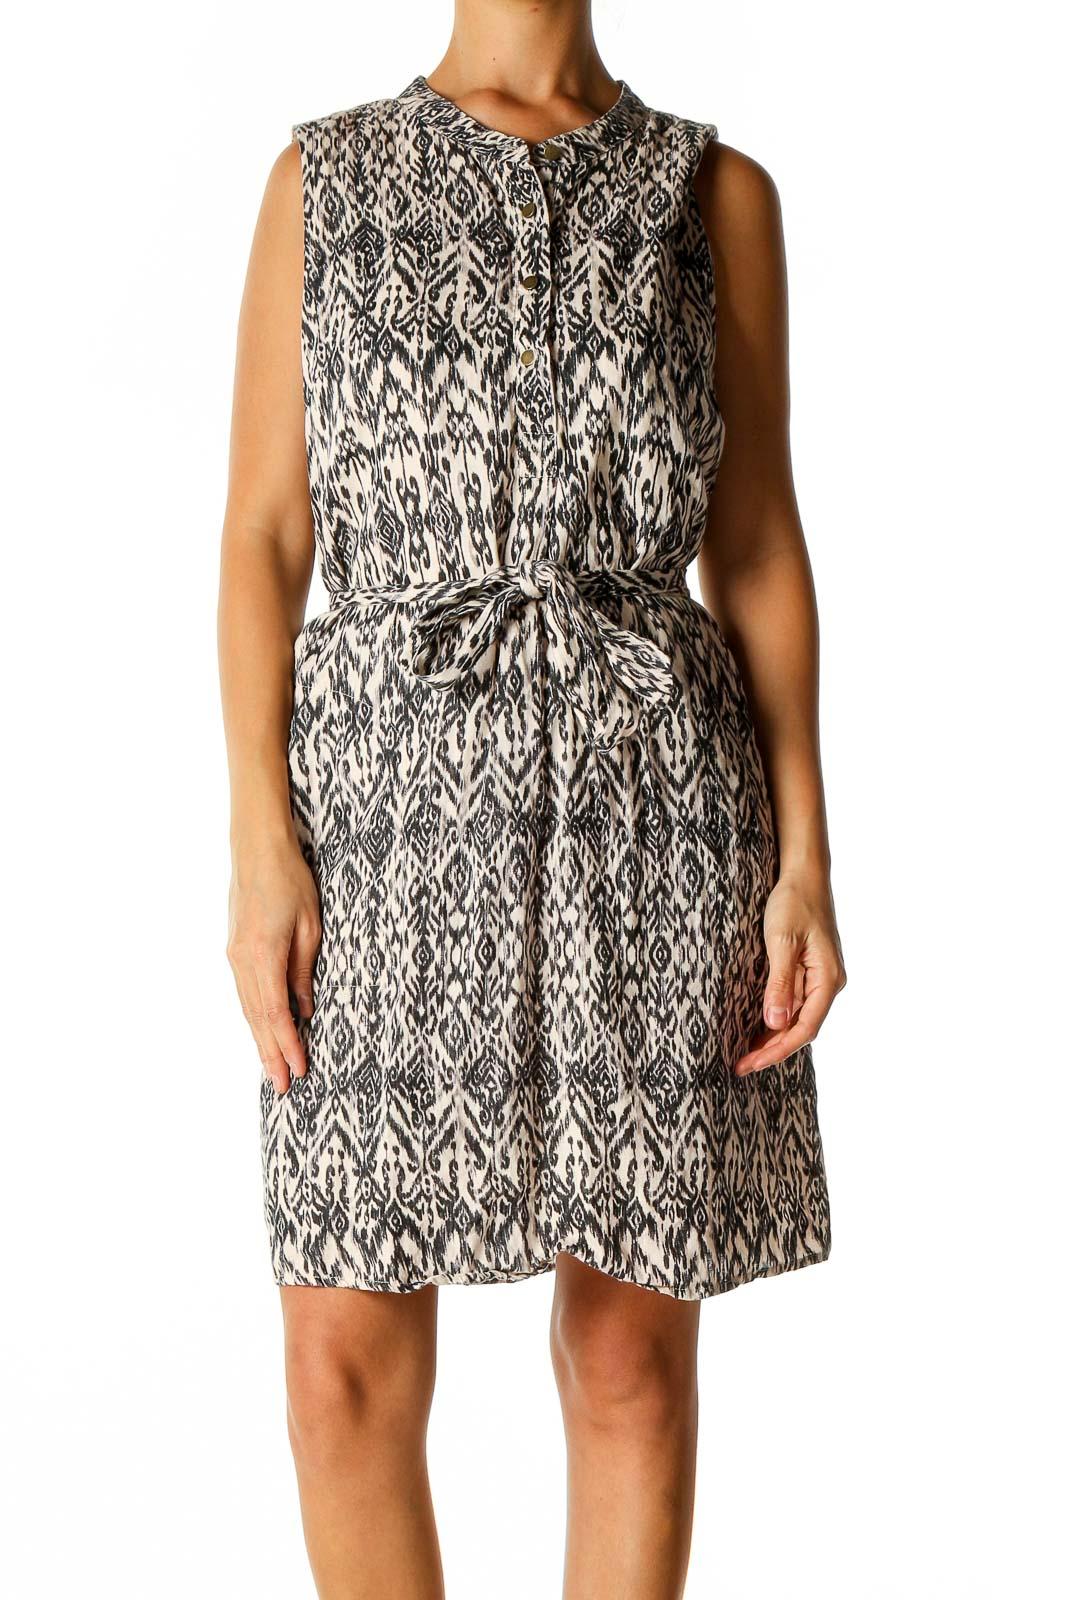 Beige Printed Bohemian Sheath Dress Front